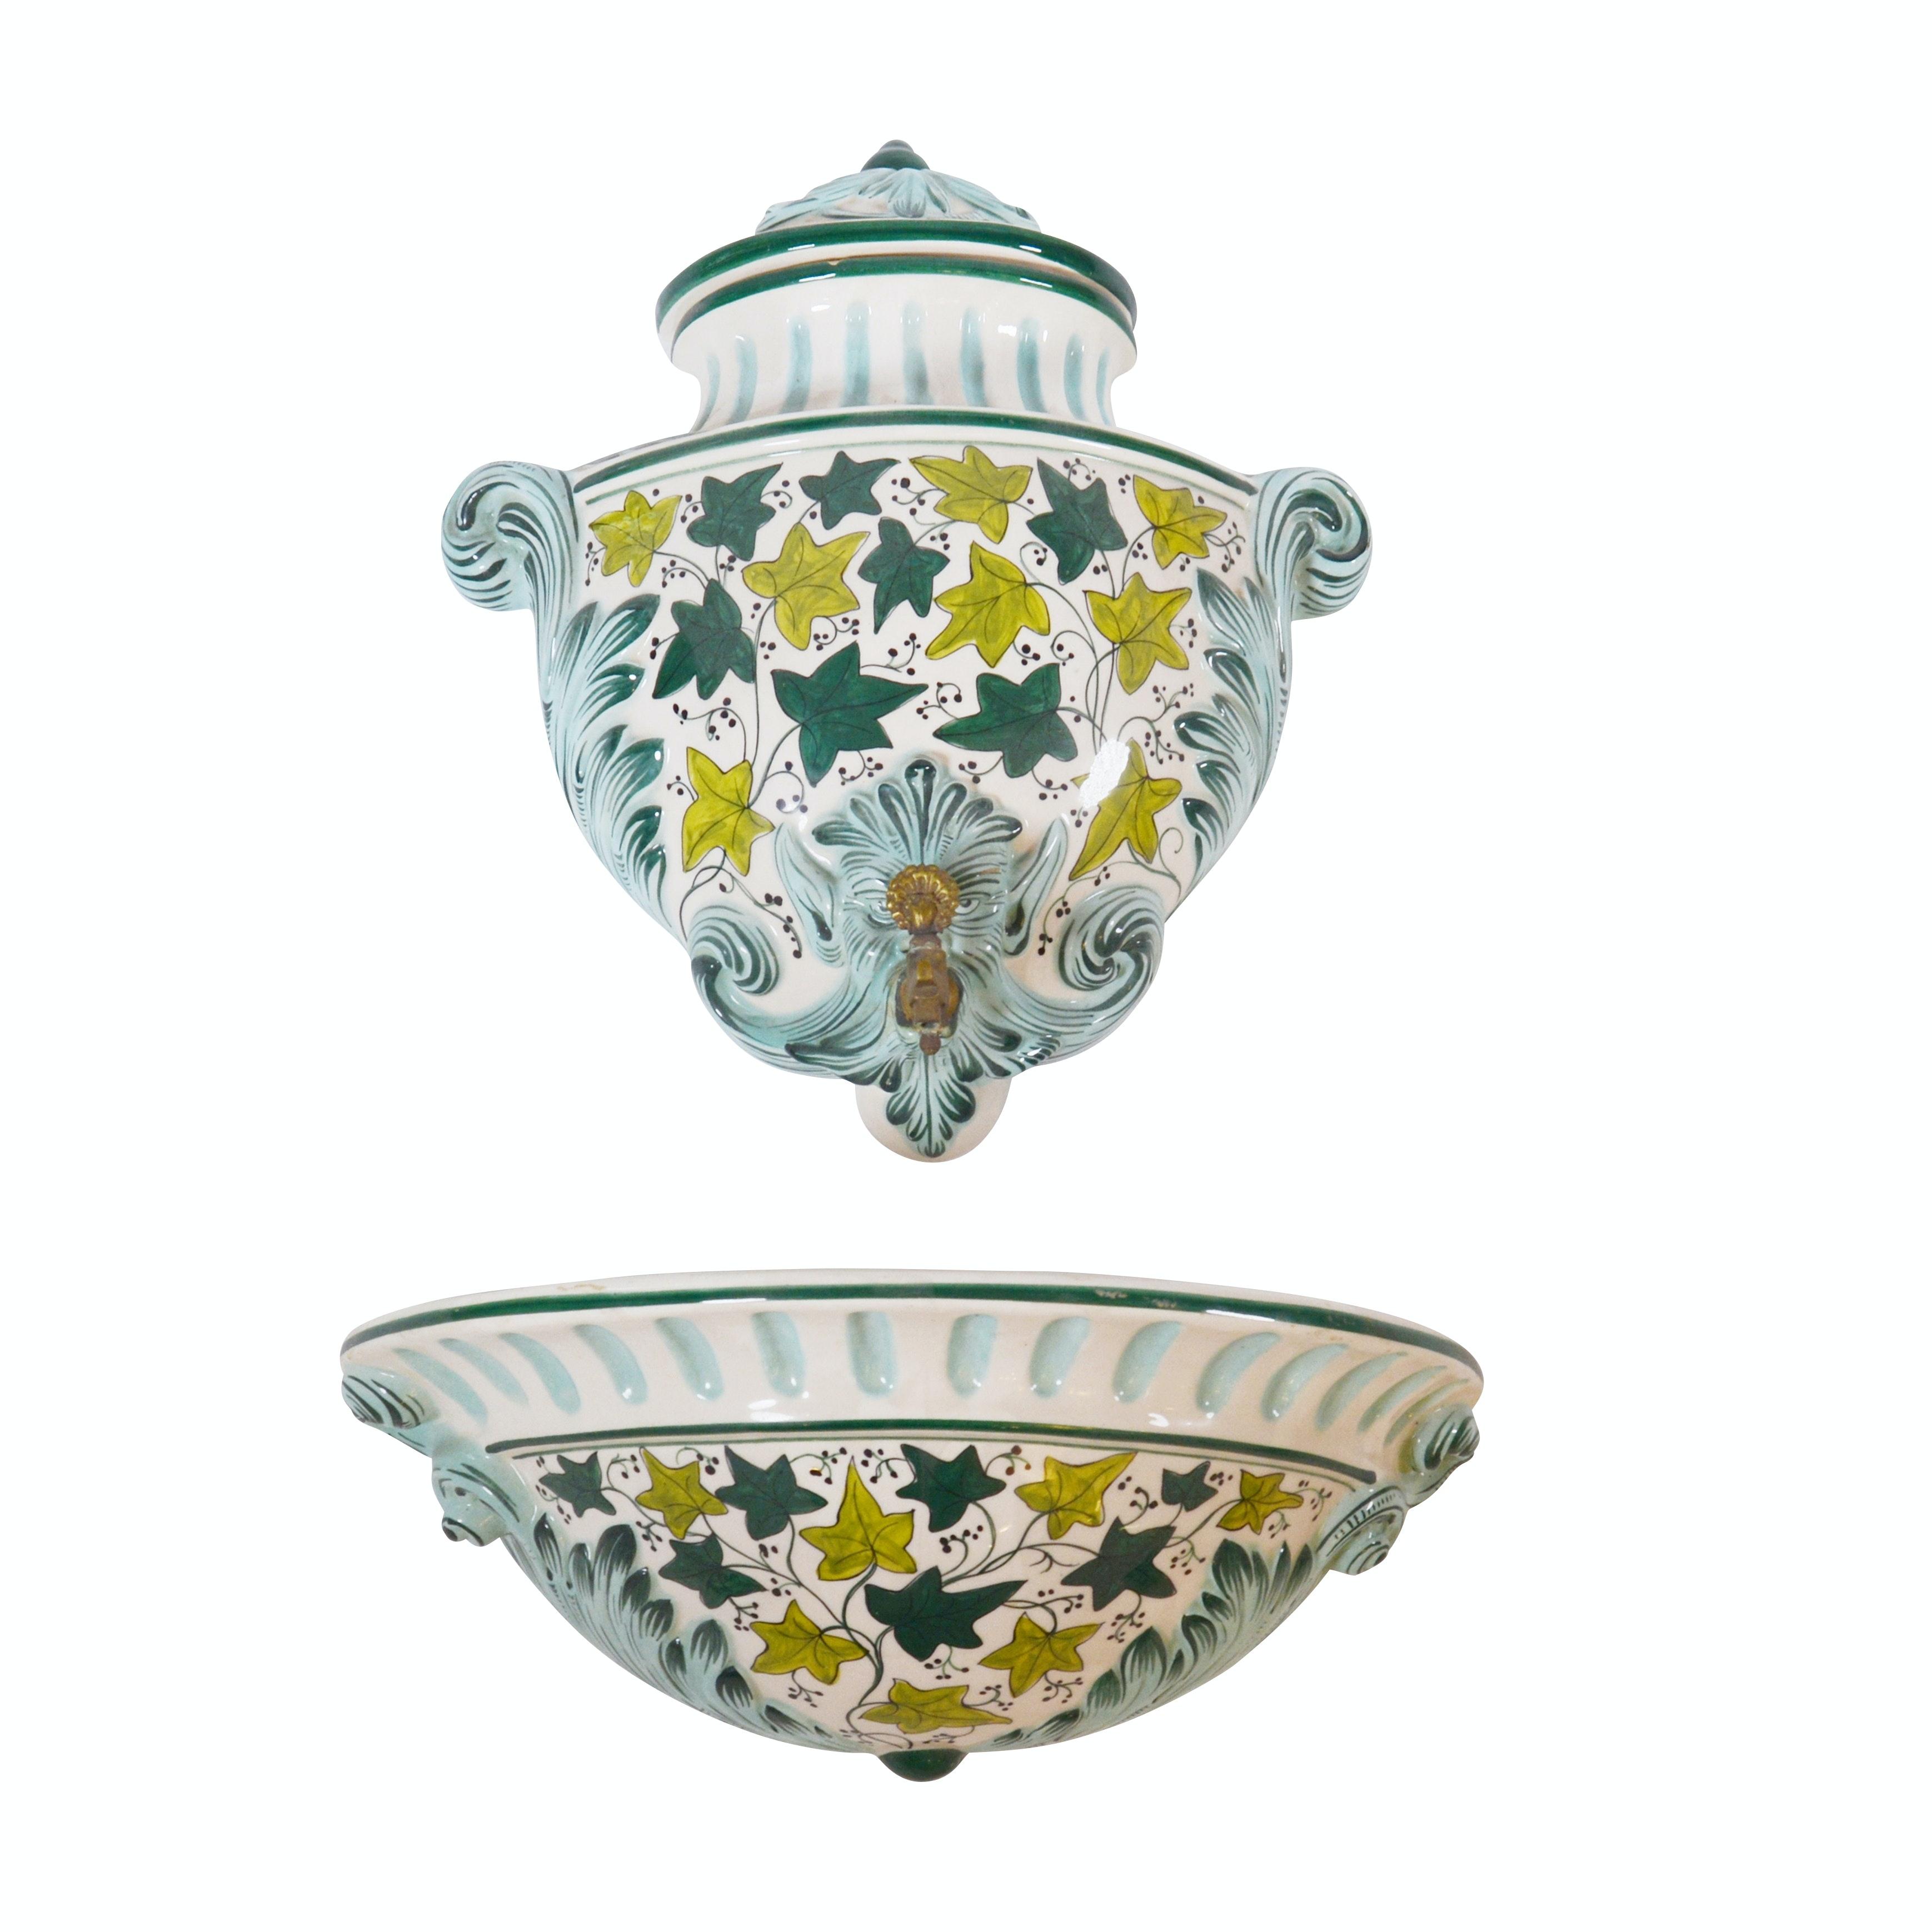 Italian Koscherak Brothers Hand-Painted Ceramic Lavabo, Mid to Late 20th Century